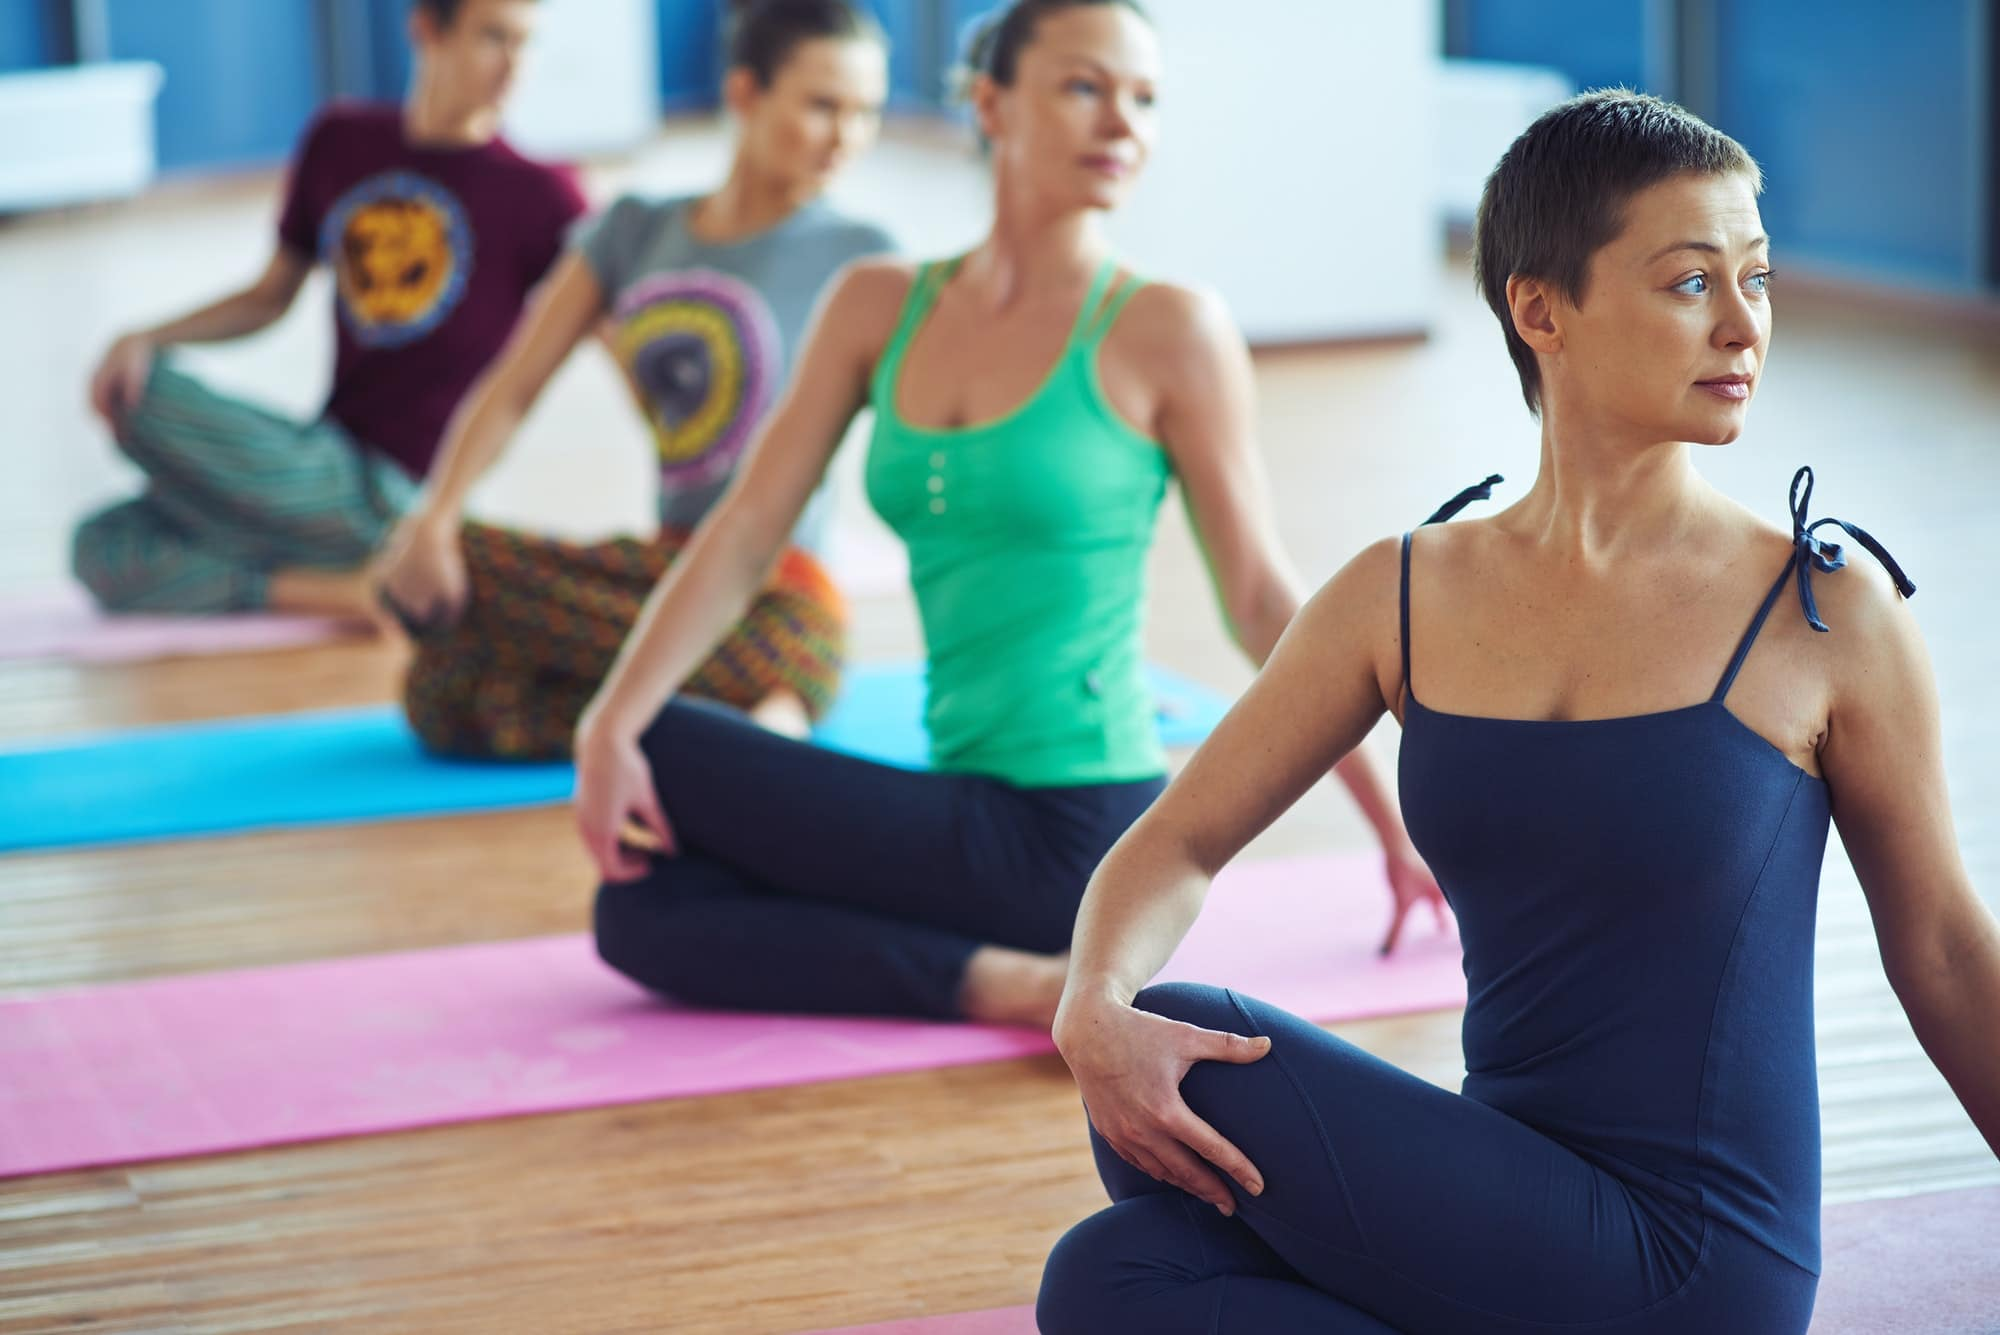 Stretching postural